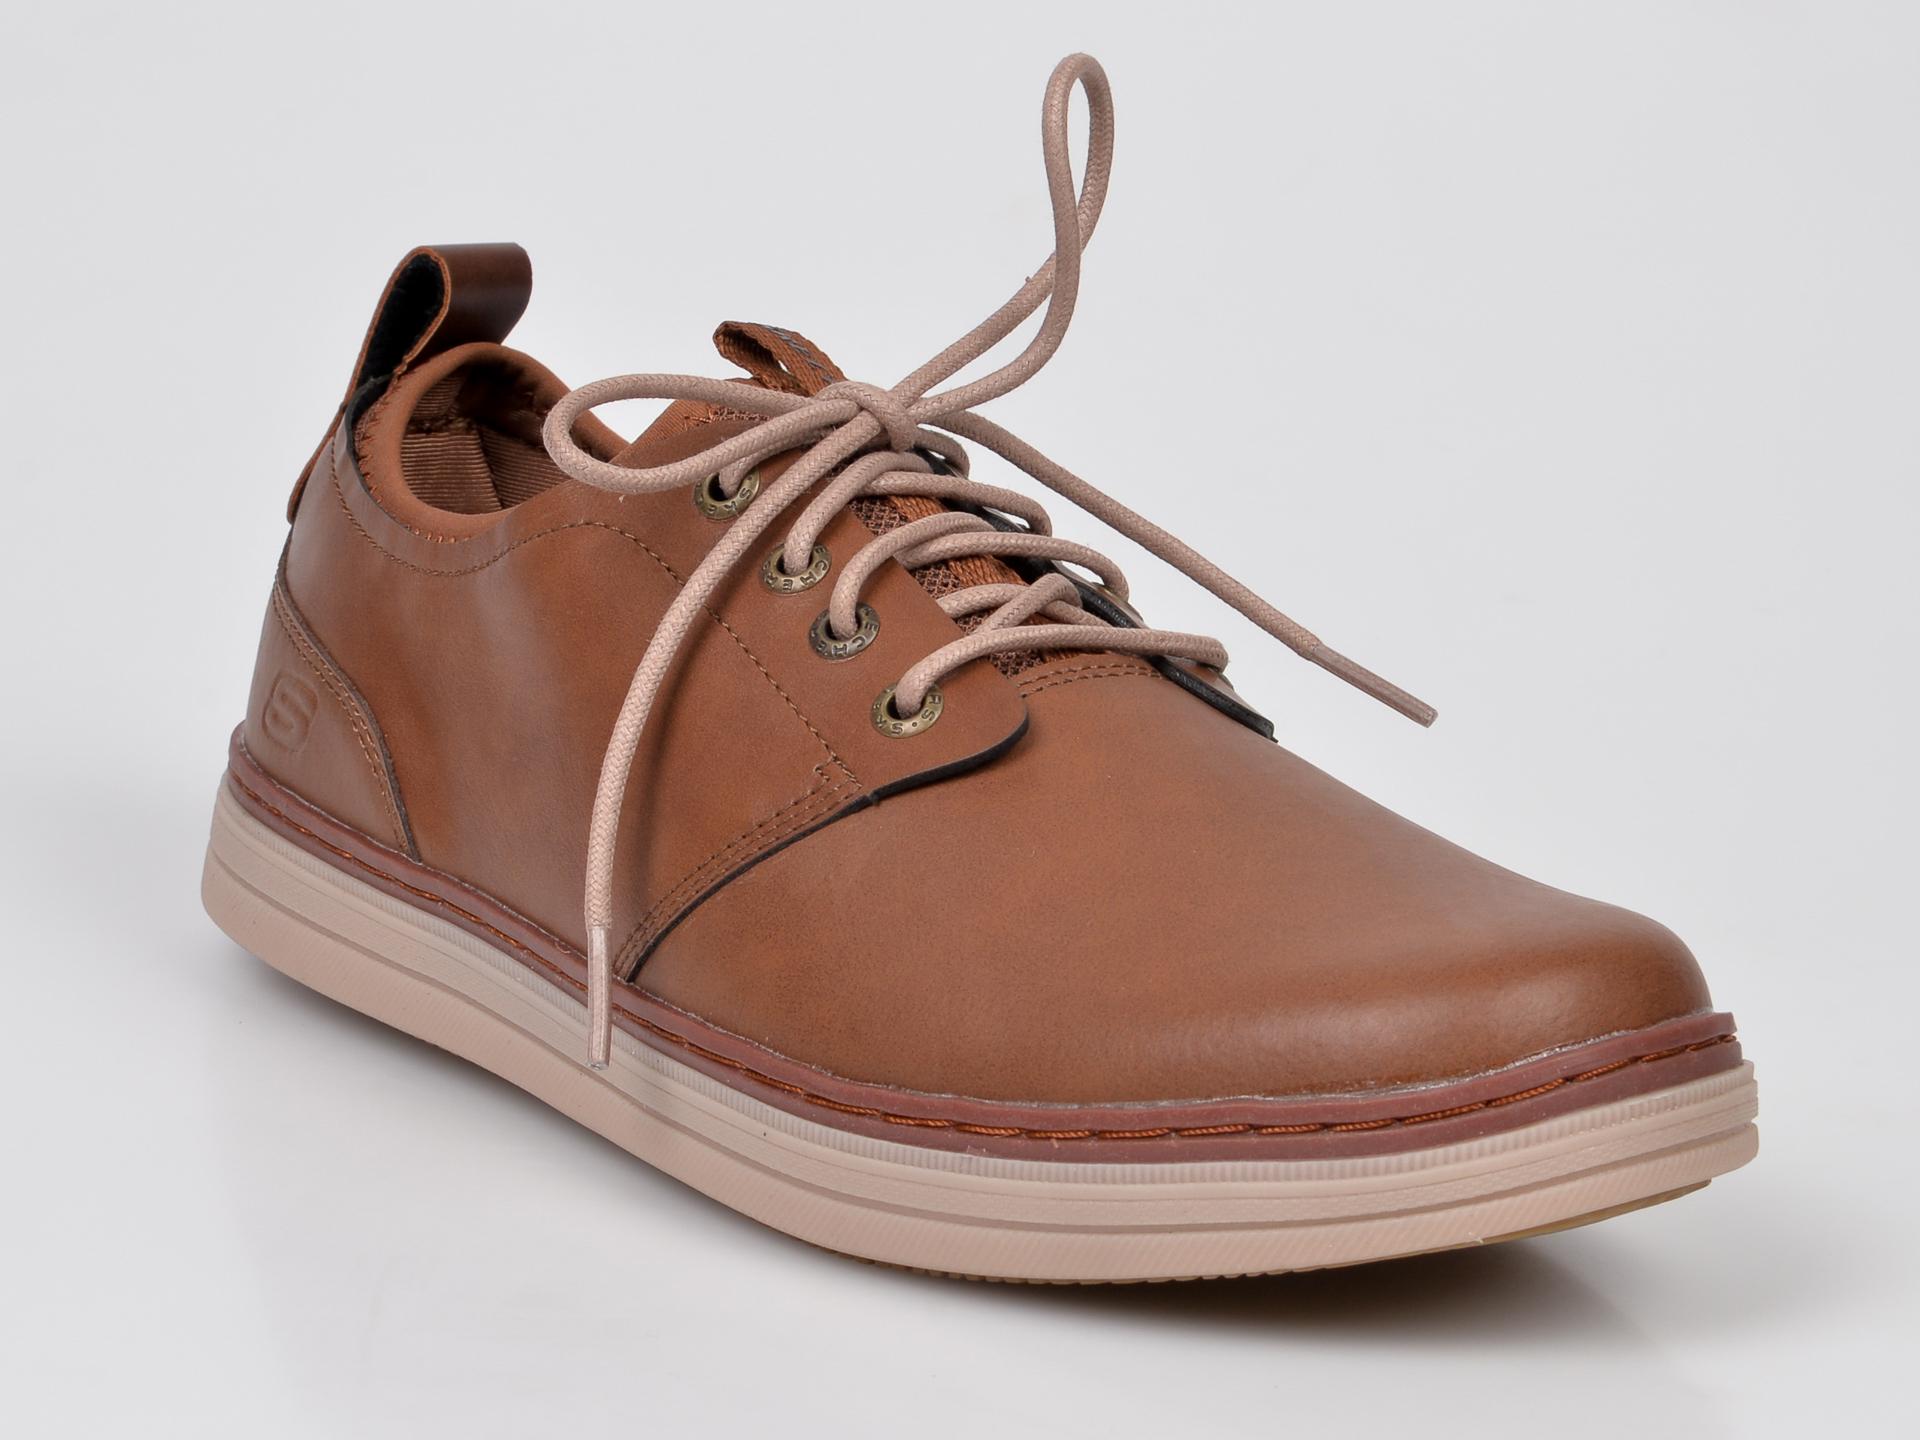 Pantofi Skechers Maro, 65877, Din Piele Naturala